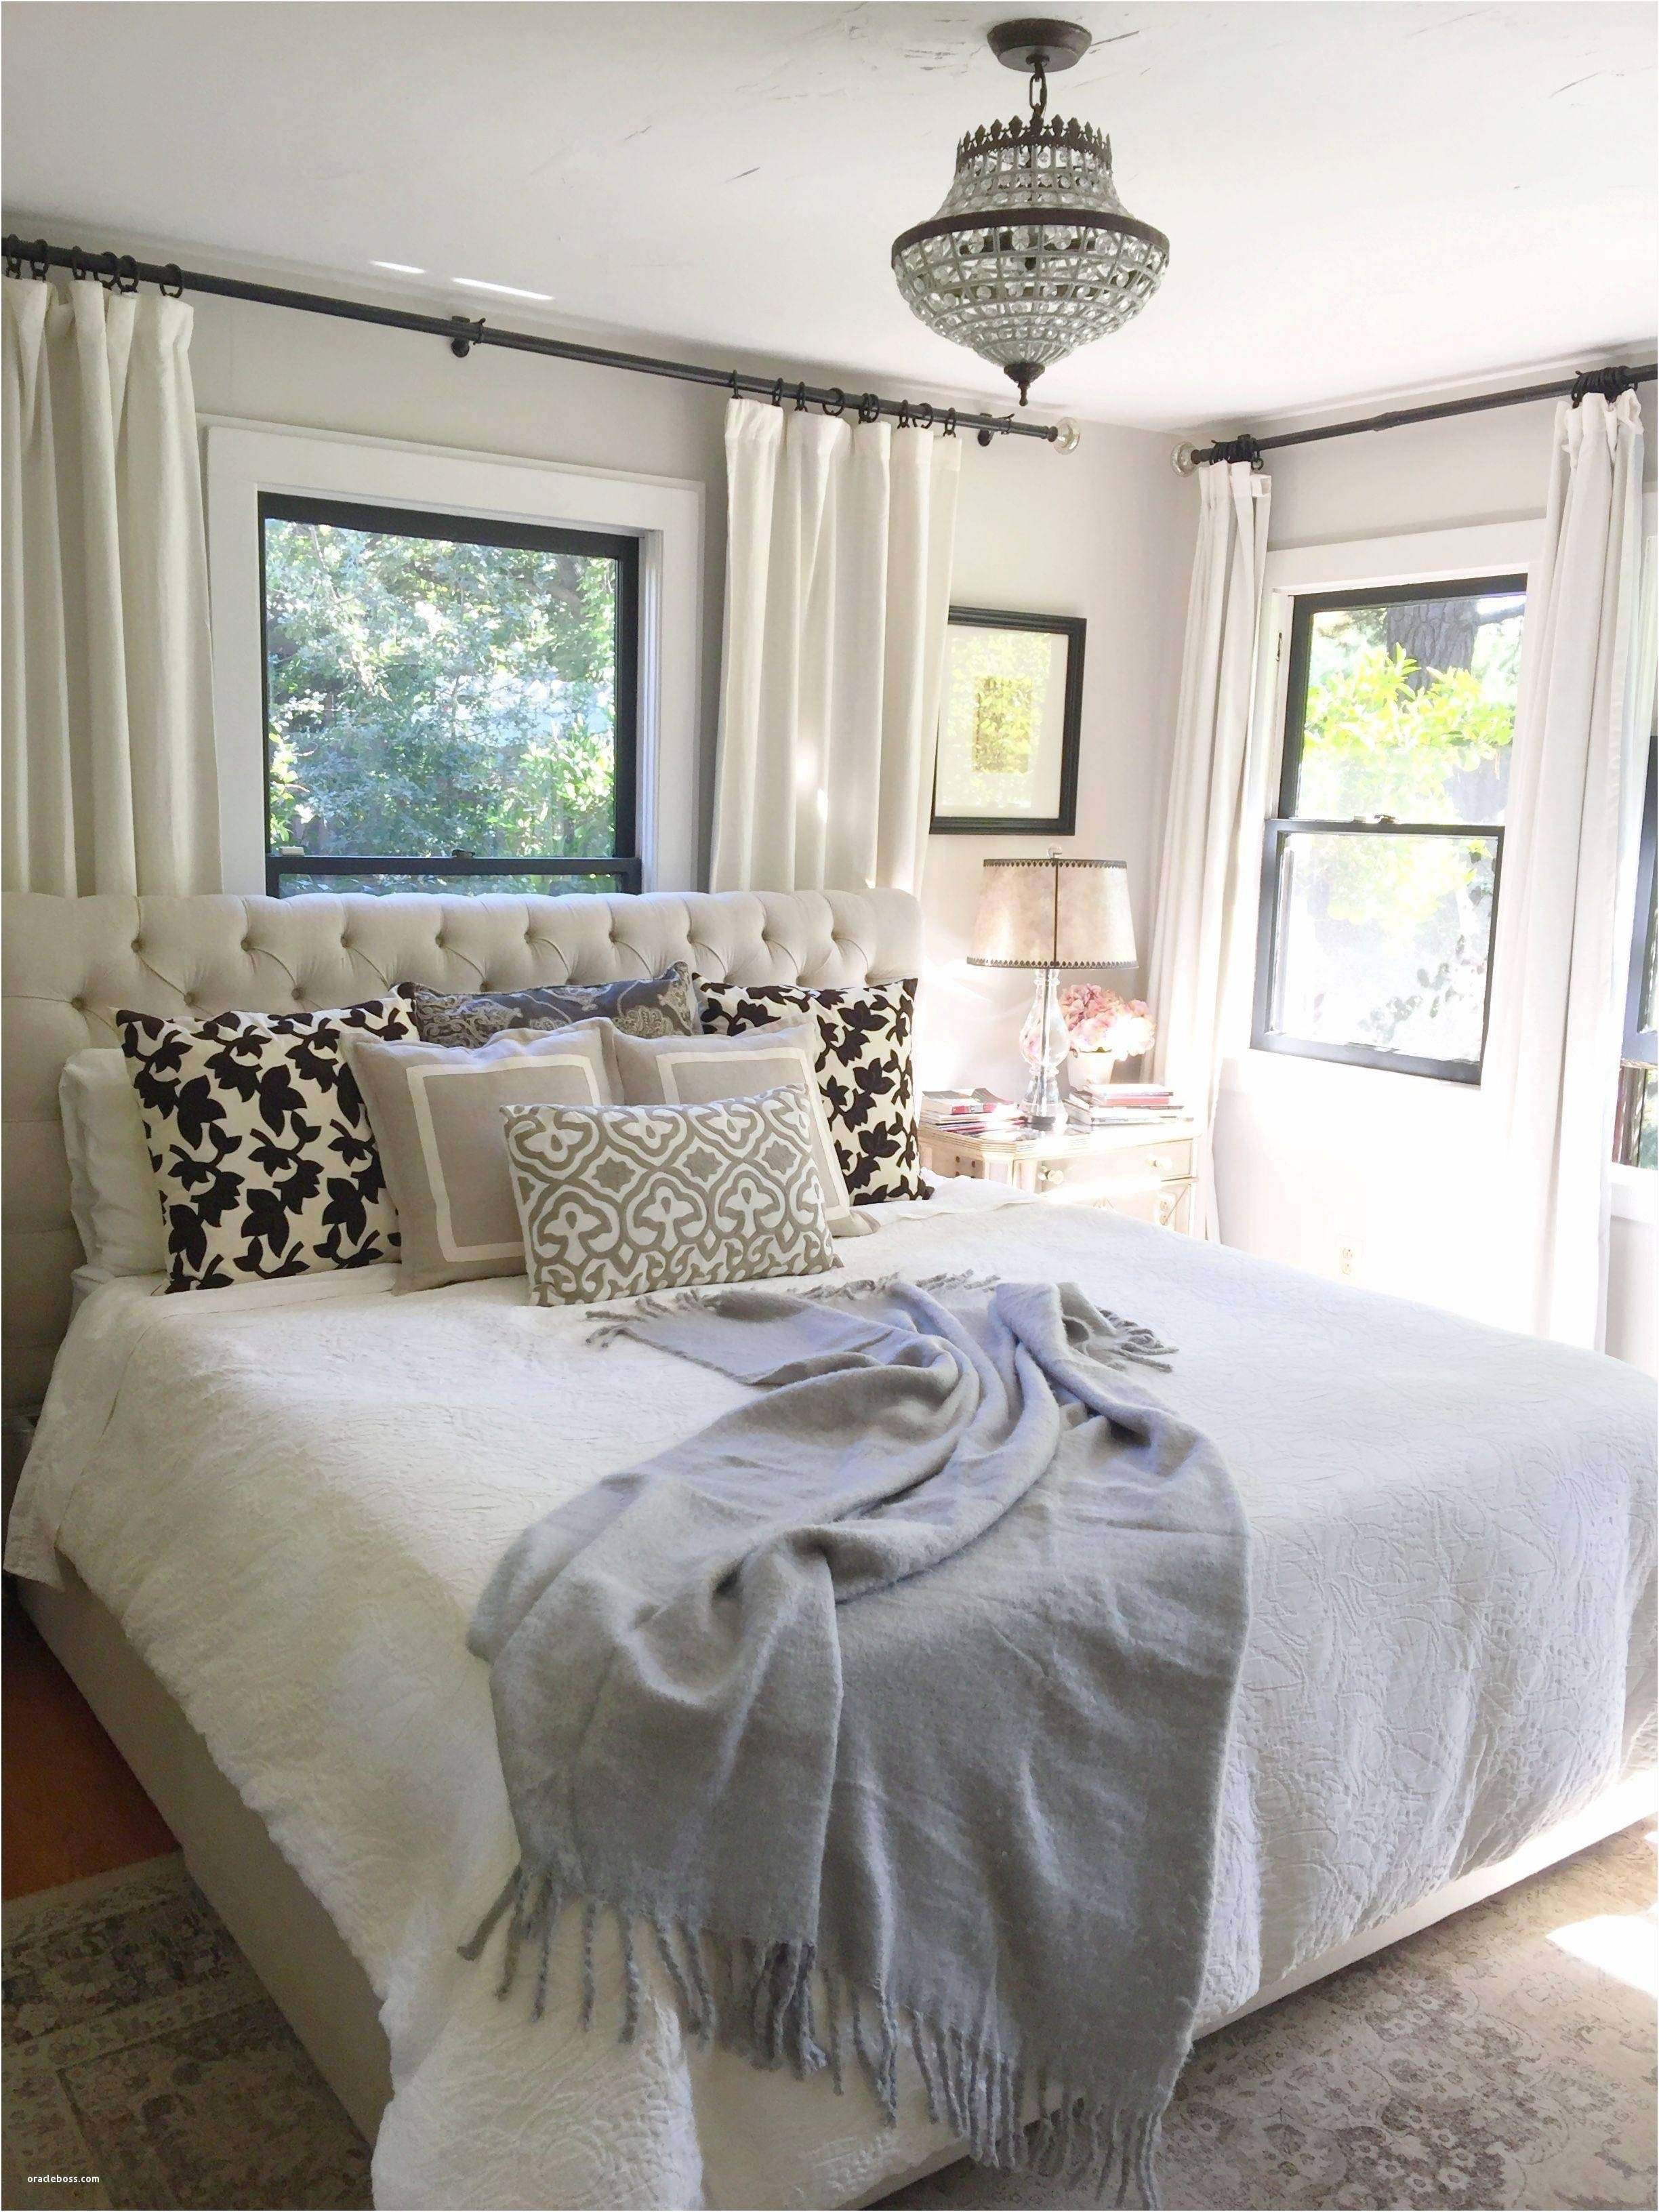 home design pondarosa furniture new furniture ponderosa furniture ideas of hand painted furniture